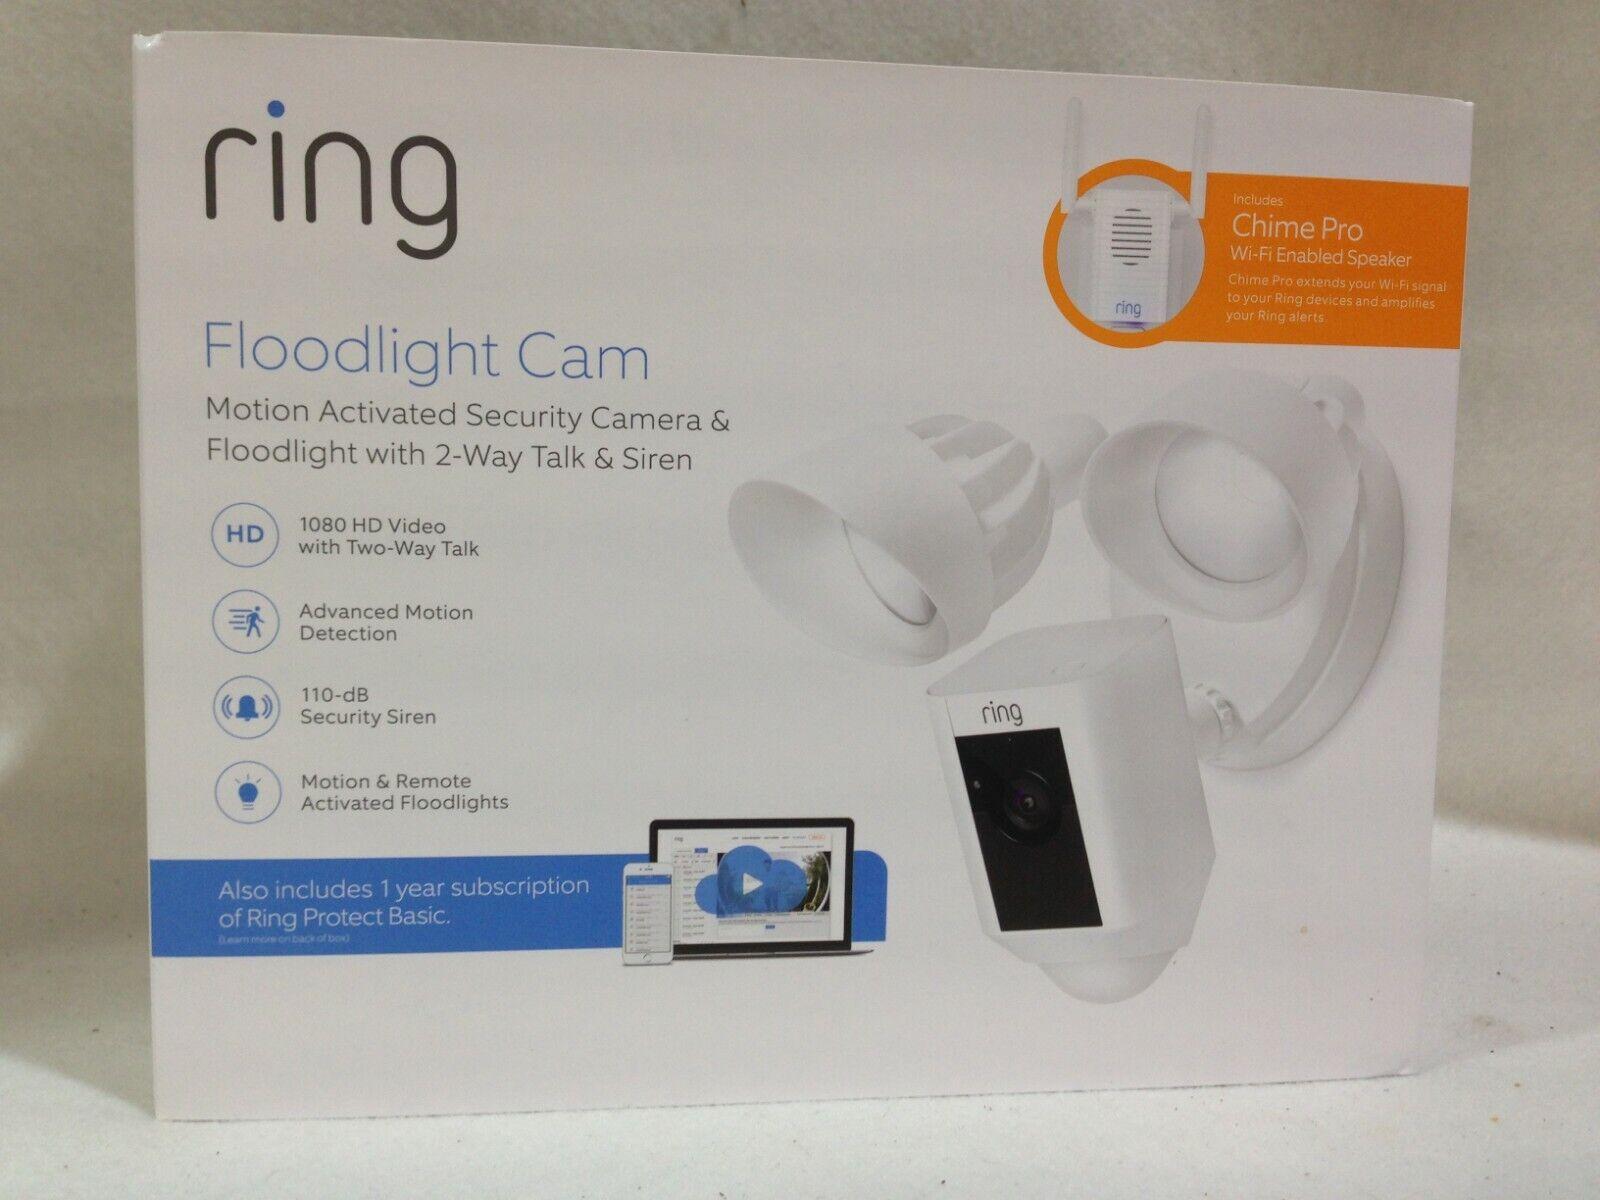 RING Floodlight Camera W/ Bonus Chime Pro & 12 Months Ring V